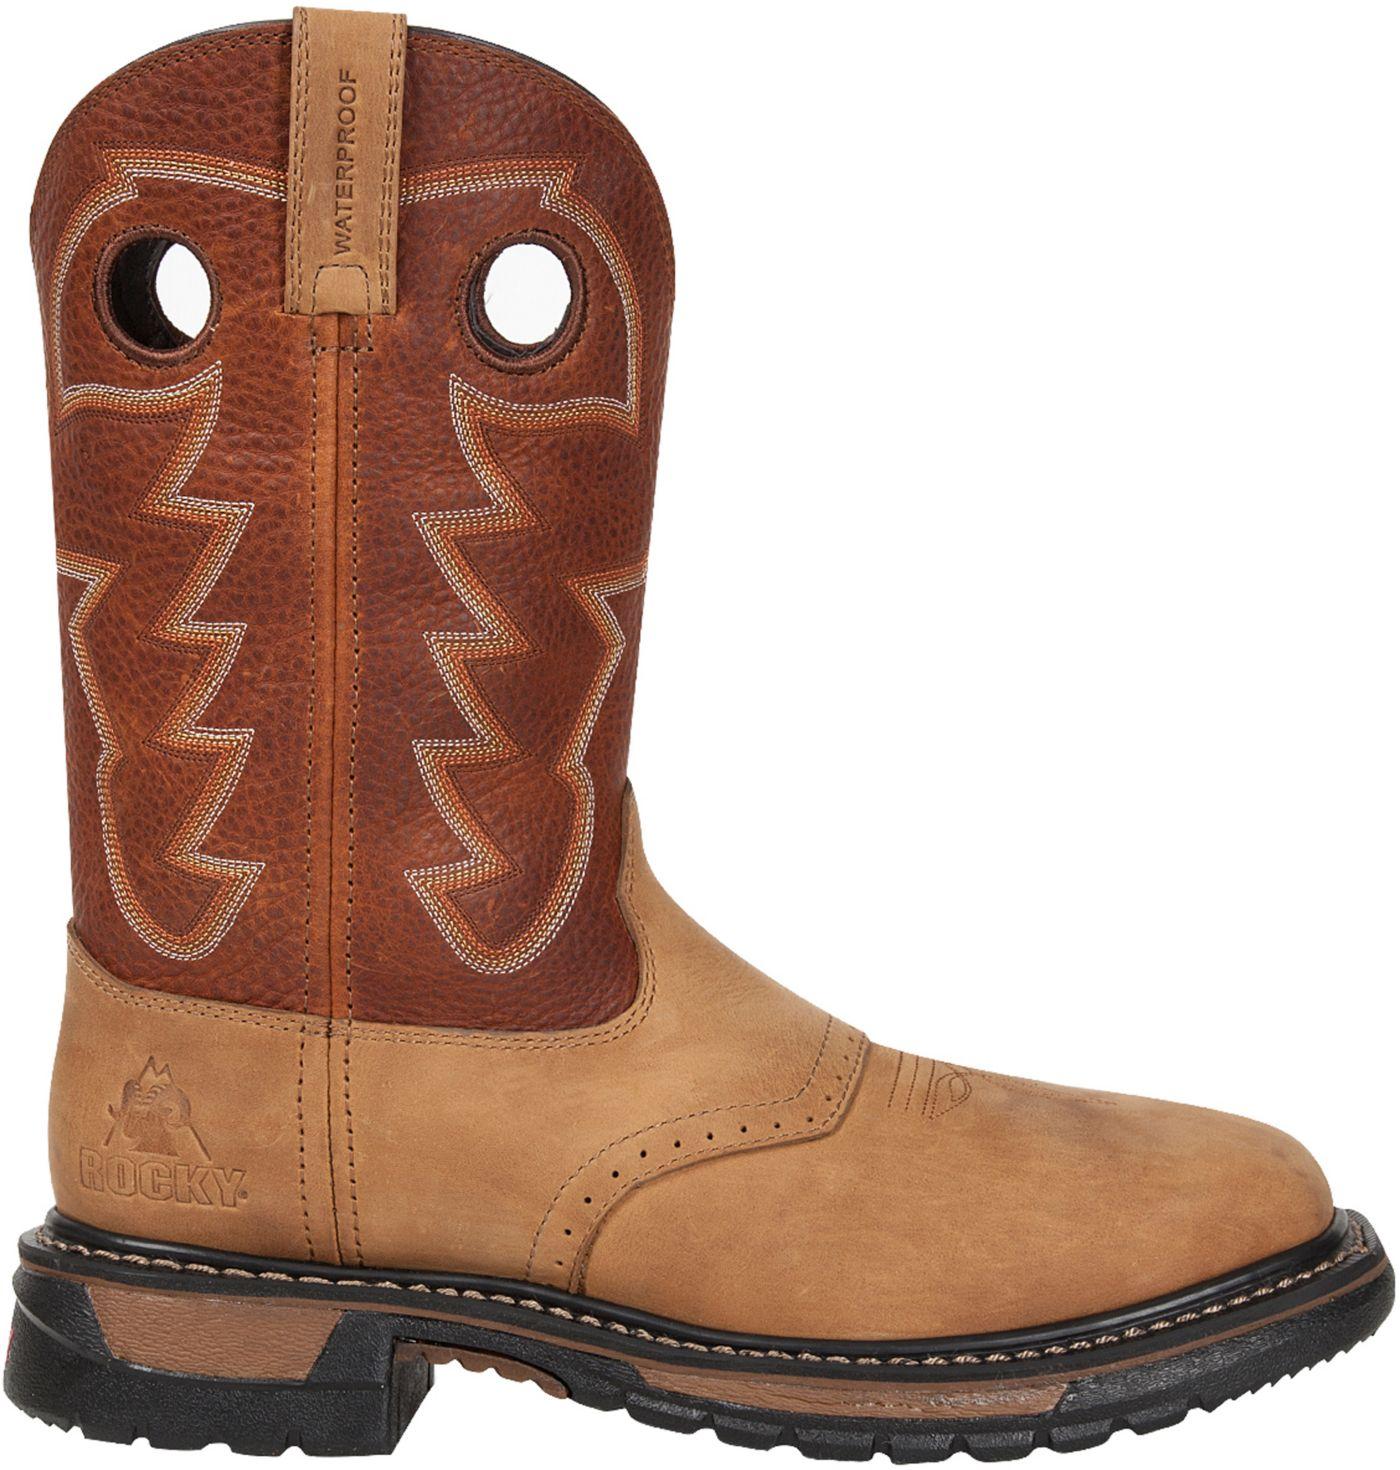 "Rocky Men's Original Ride 11"" Steel Toe Western Work Boots"